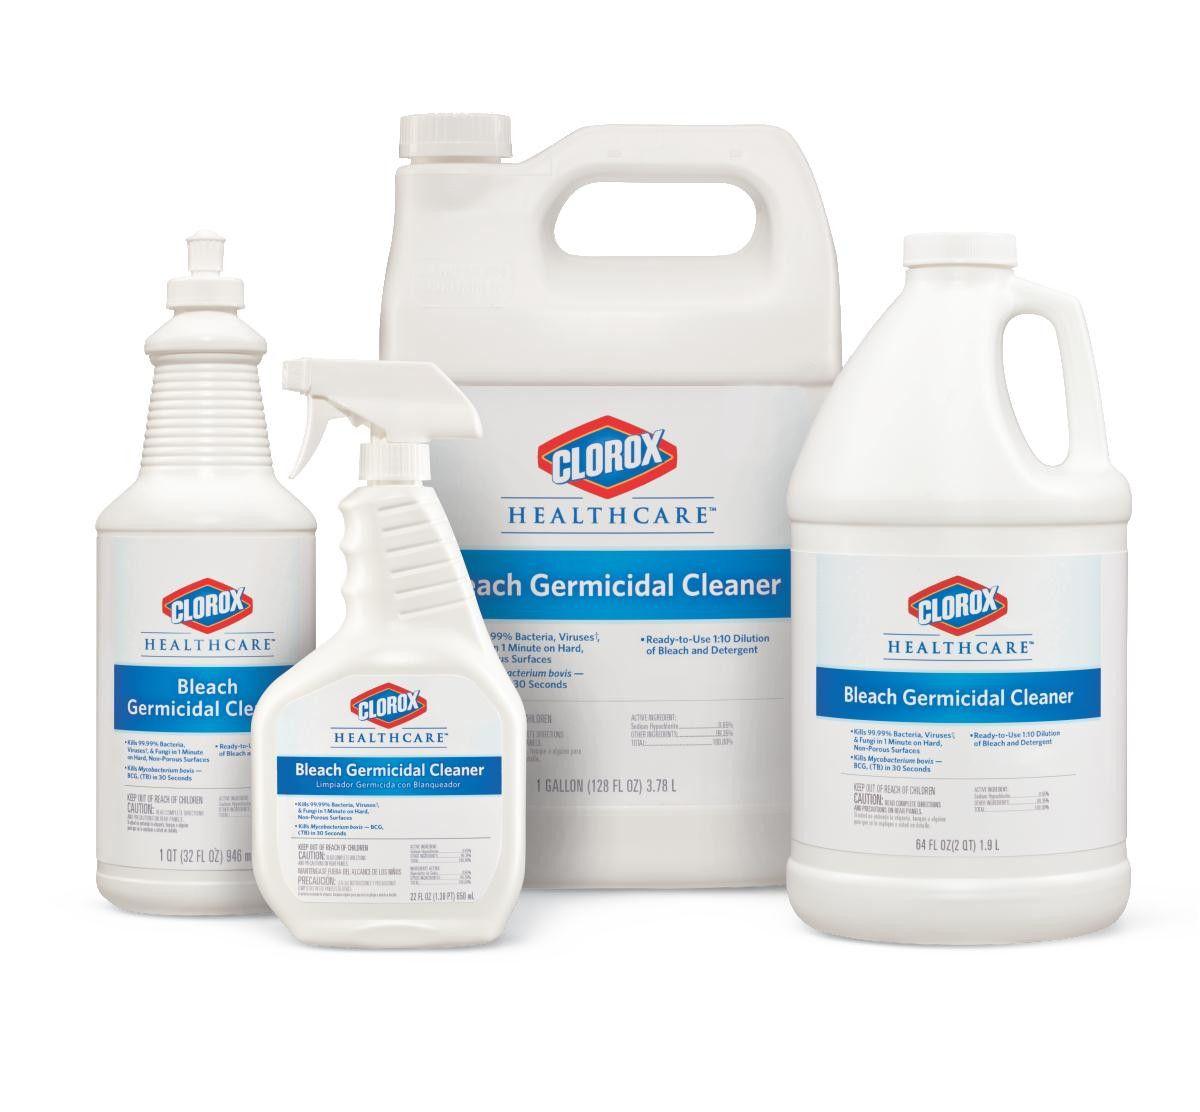 Bleaching powder for cleaning bathroom - Clorox Healthcare Bleach Germicidal Cleaner